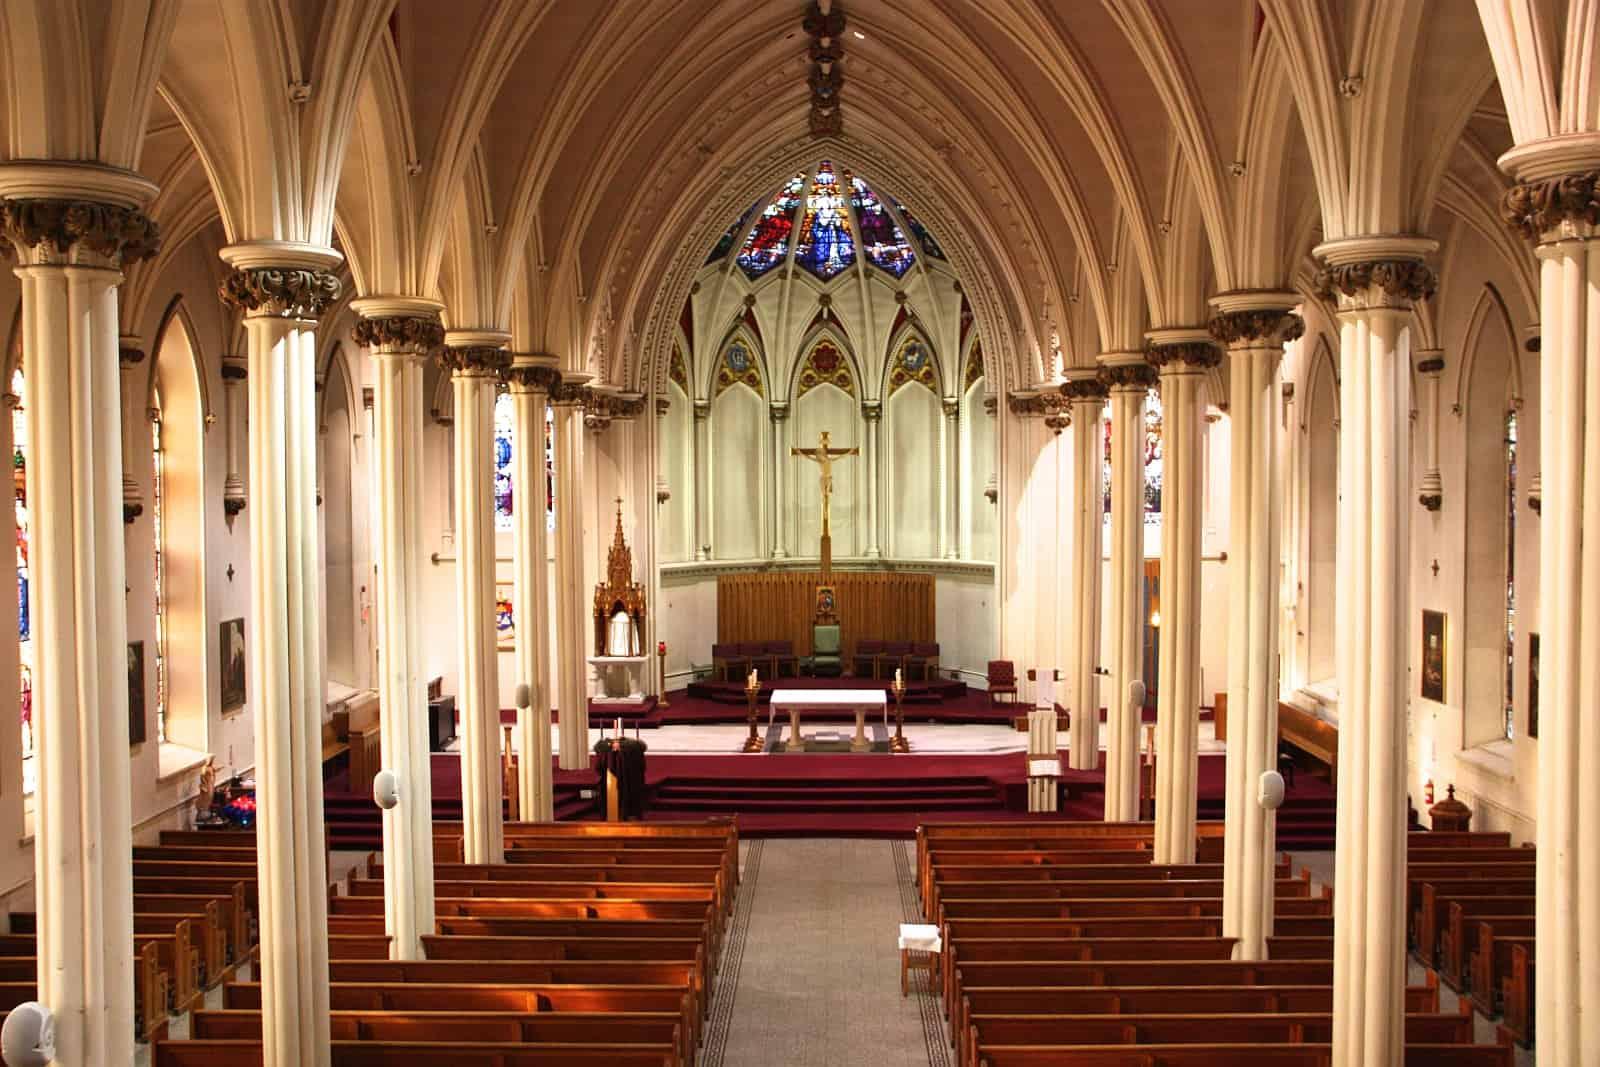 Innenraum der St. Mary's Basilika Halifax. Foto Diözese Halifax